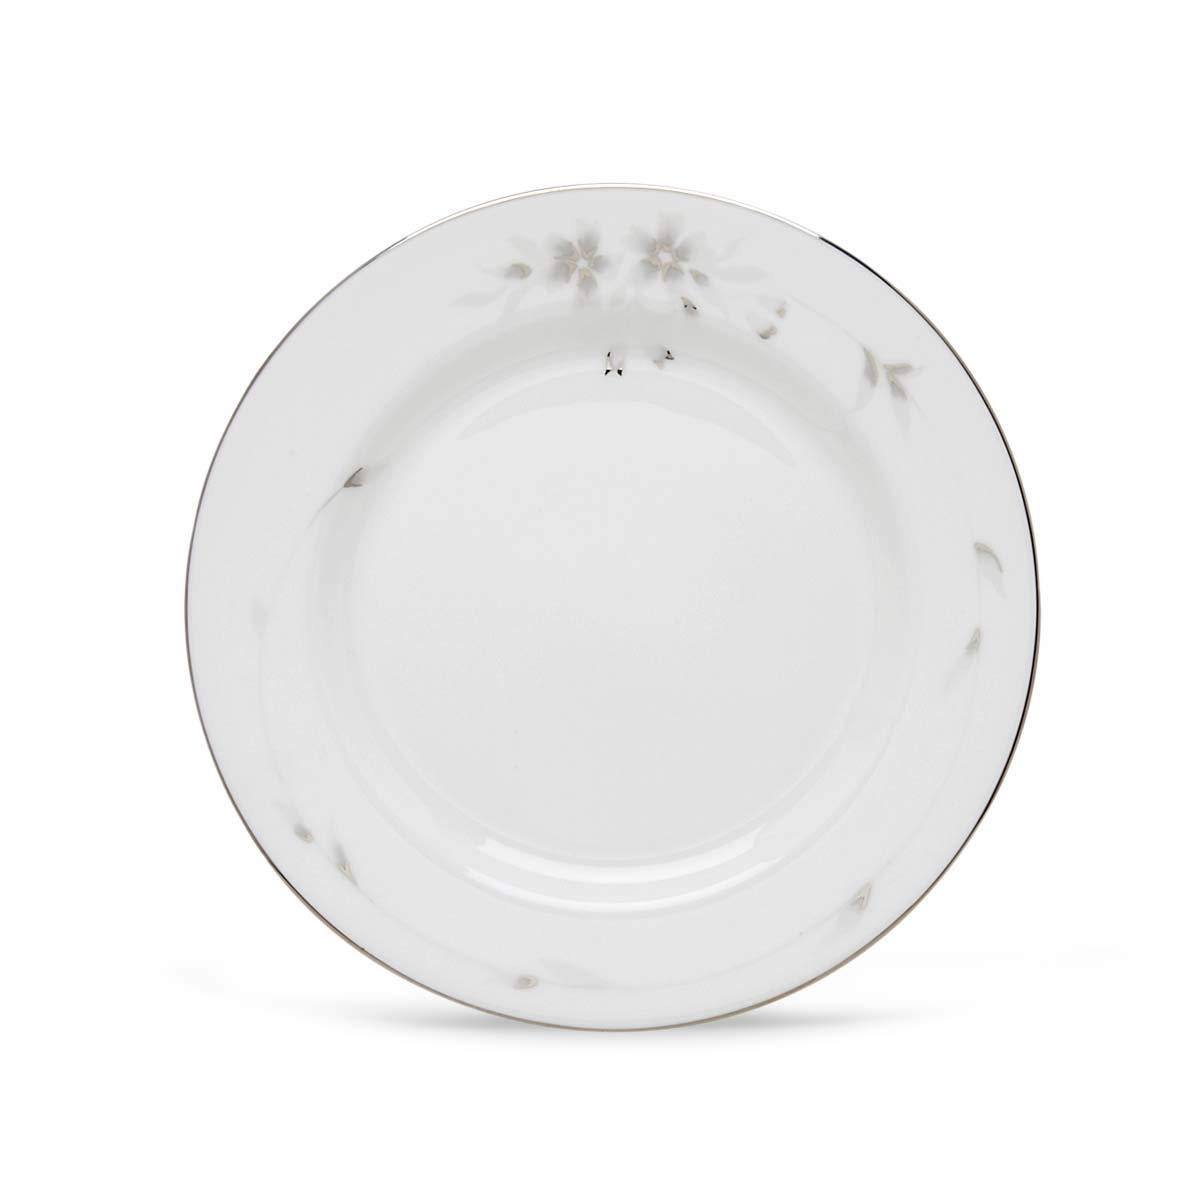 "LENOX ""SHEER BLISS"" PLATINUM SET/2 DINNER PLATES FINE BONE CHINA MADE IN USA NEW"